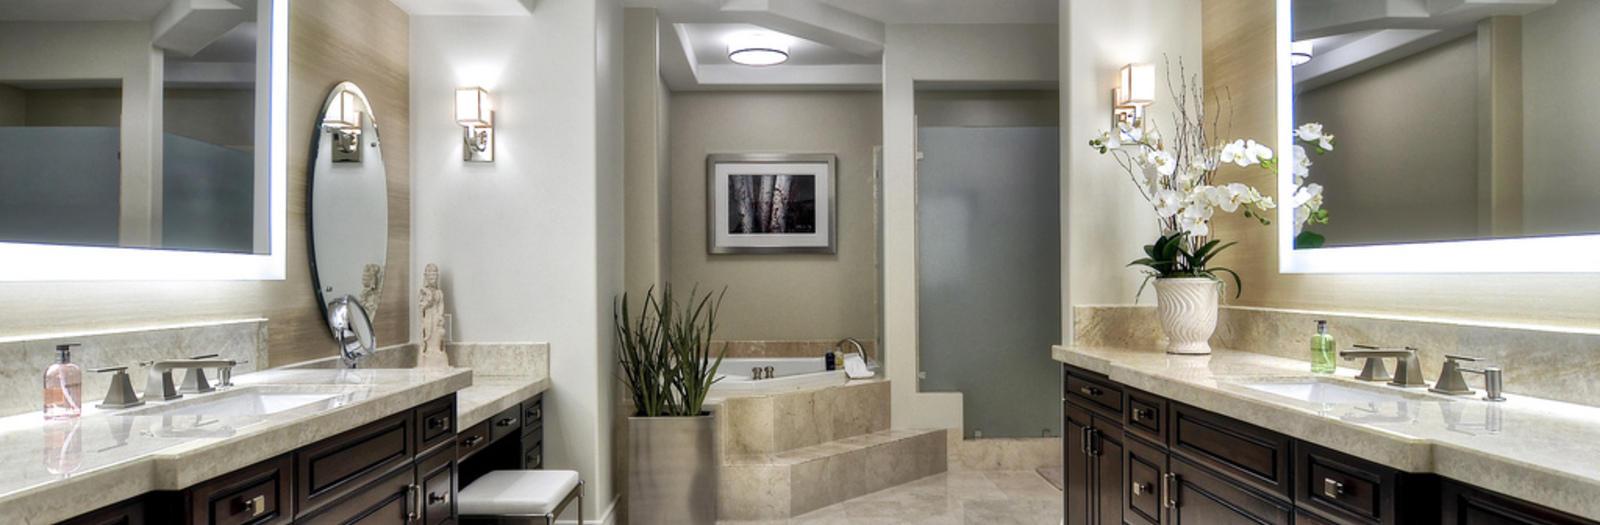 Architectural Design Cabinet Works Inc Houston